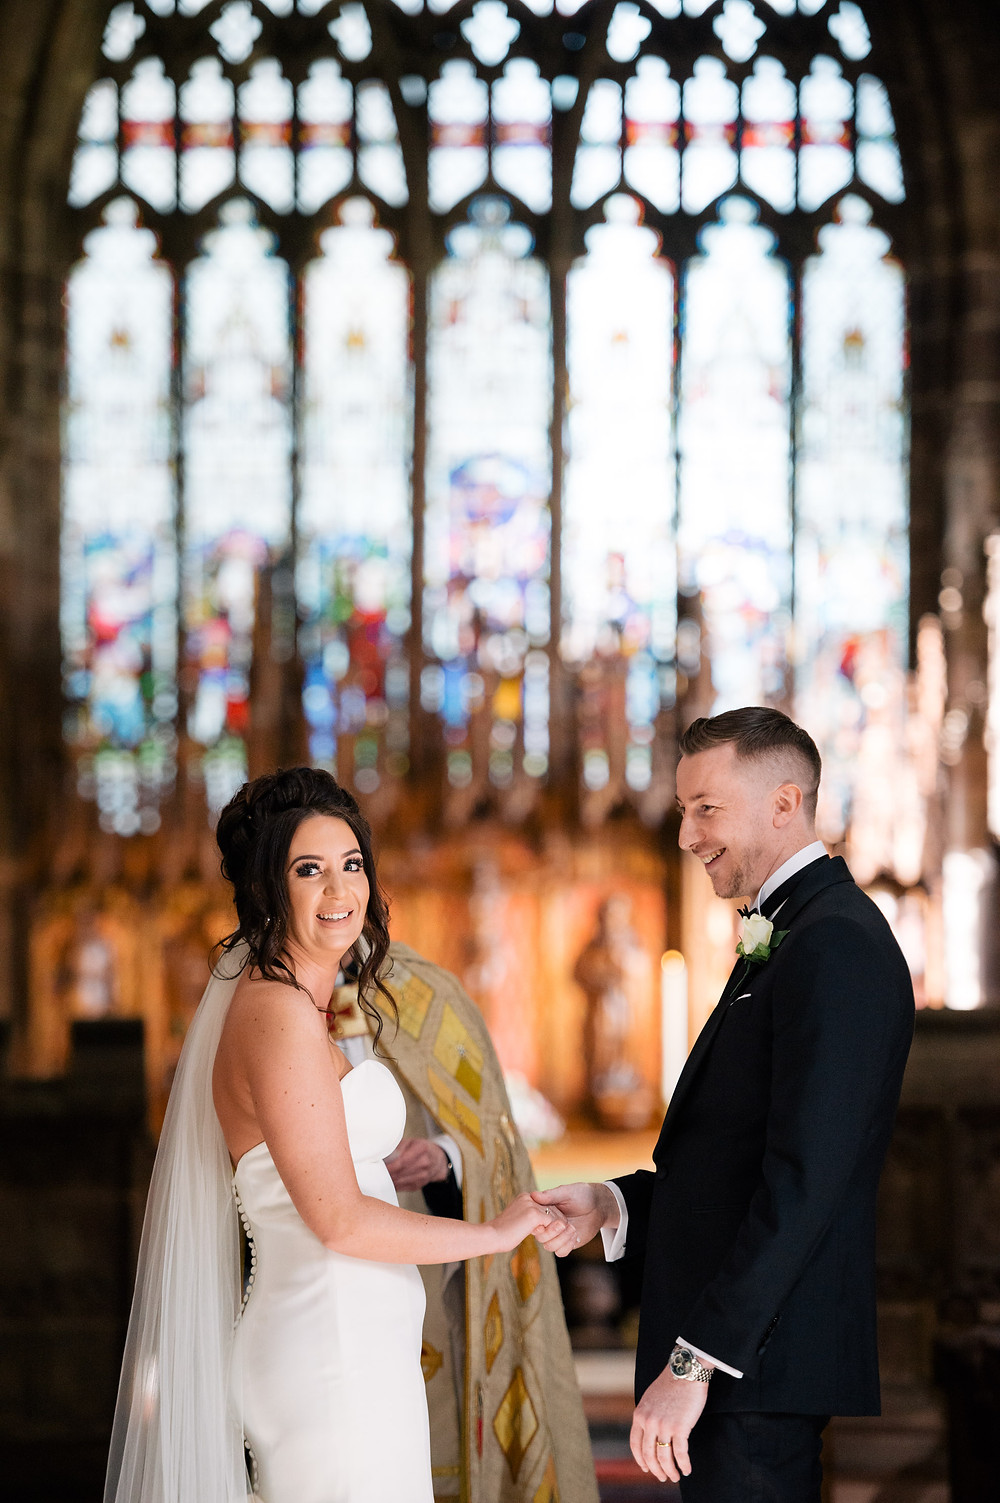 Nantwich Photography, Wrenbury Hall Wedding Photographer